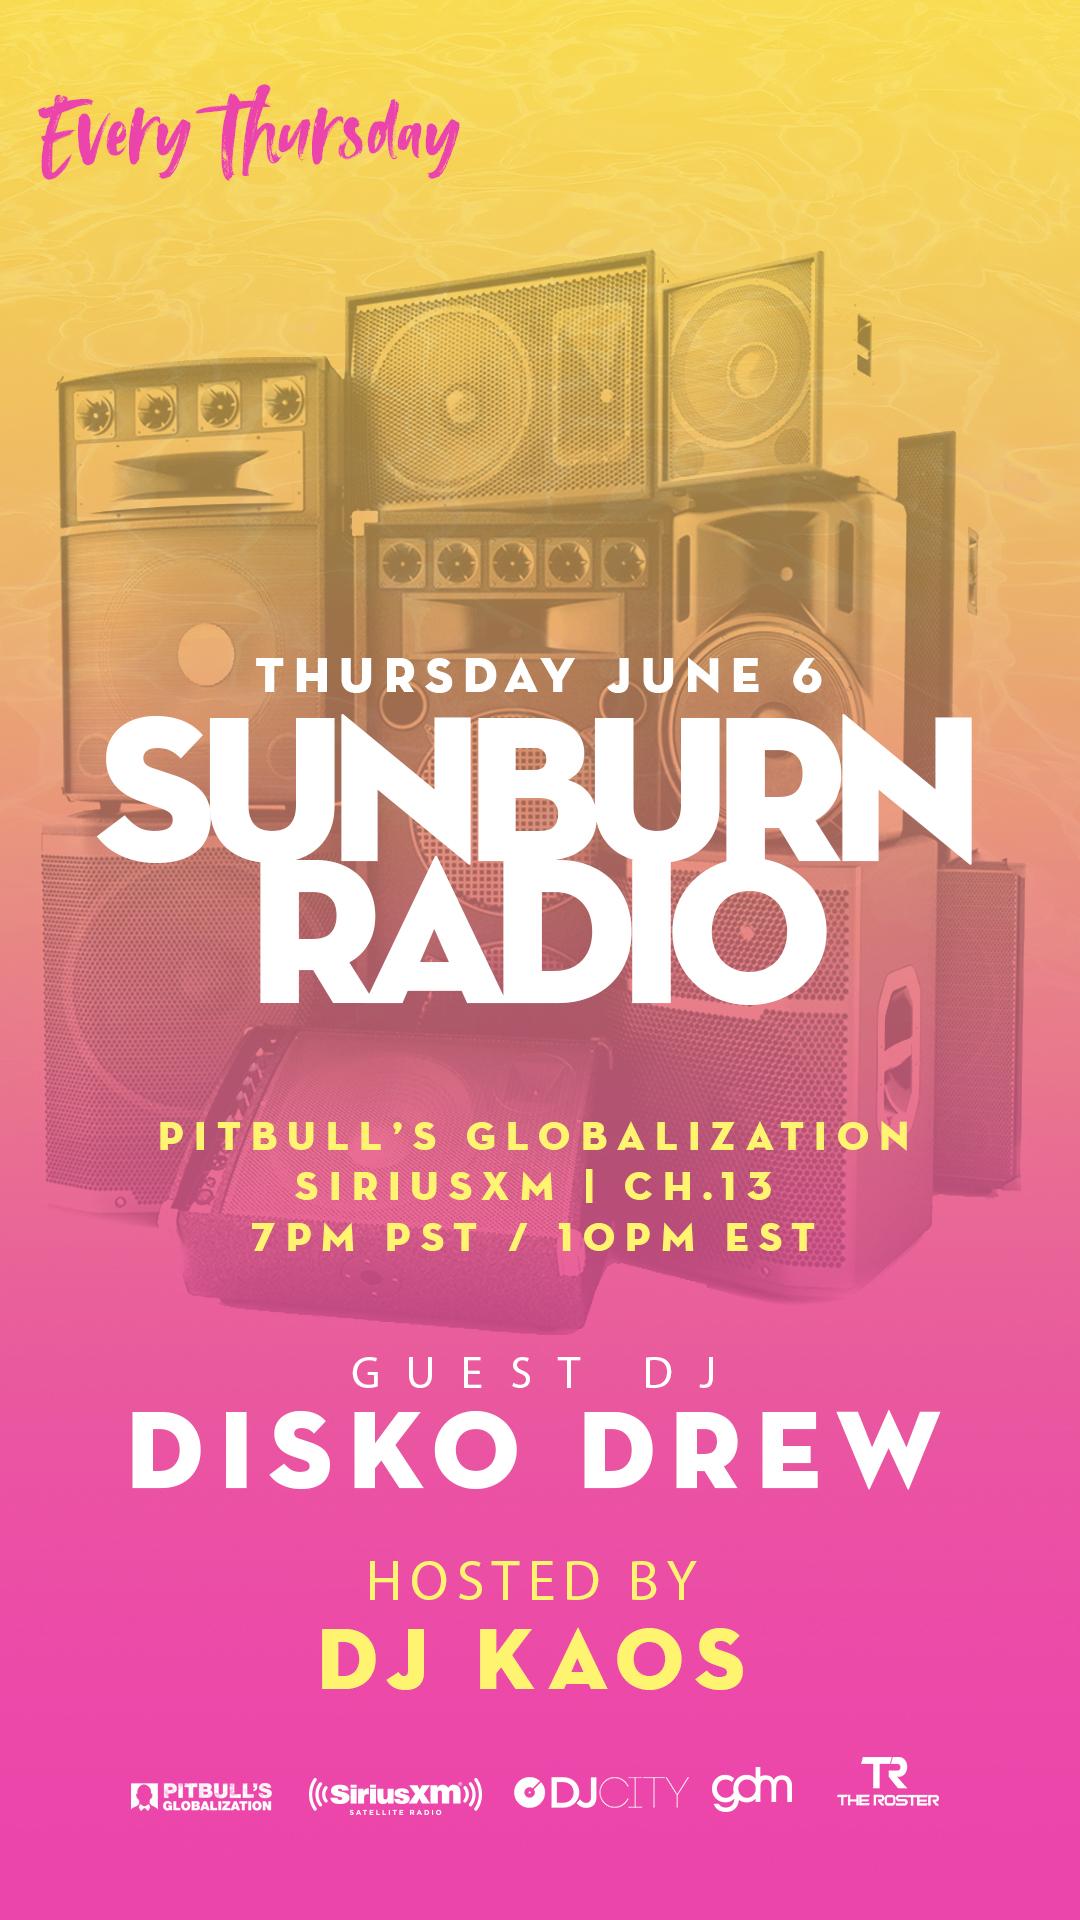 SunburnRadio-IGArt-060619-DiskoDrew.jpg